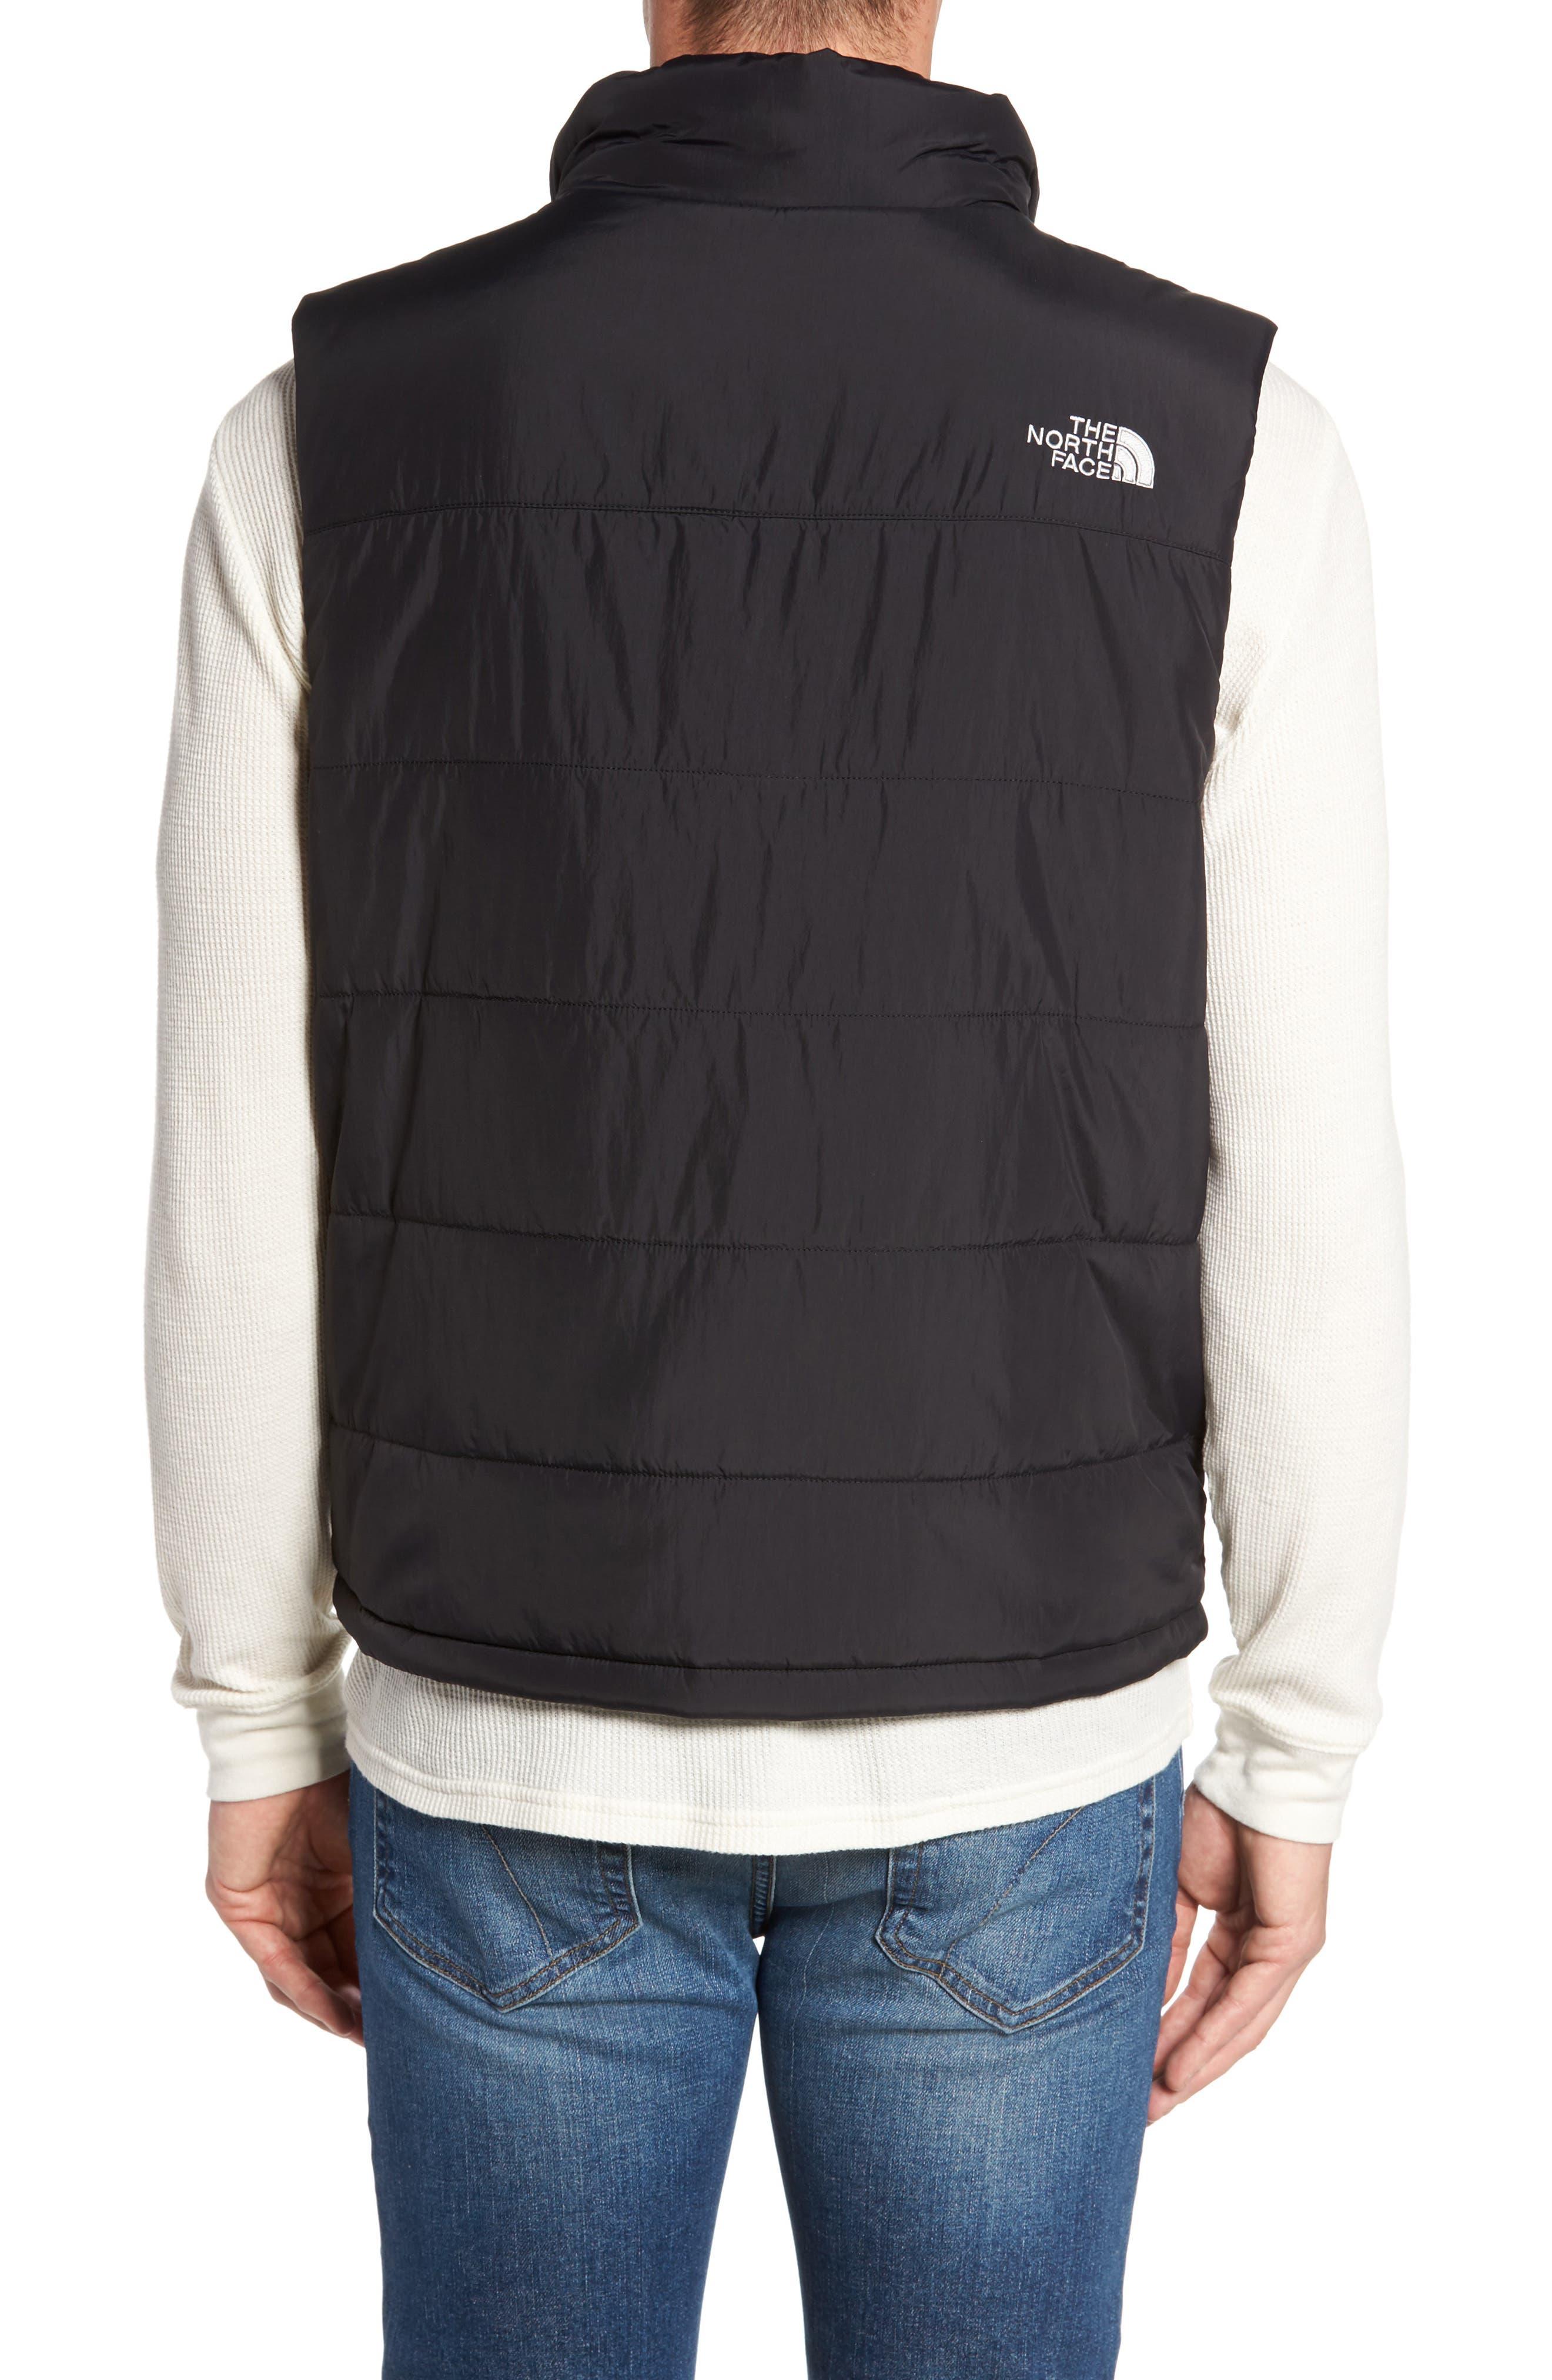 Harway Heatseeker Insulated Vest,                             Alternate thumbnail 2, color,                             001